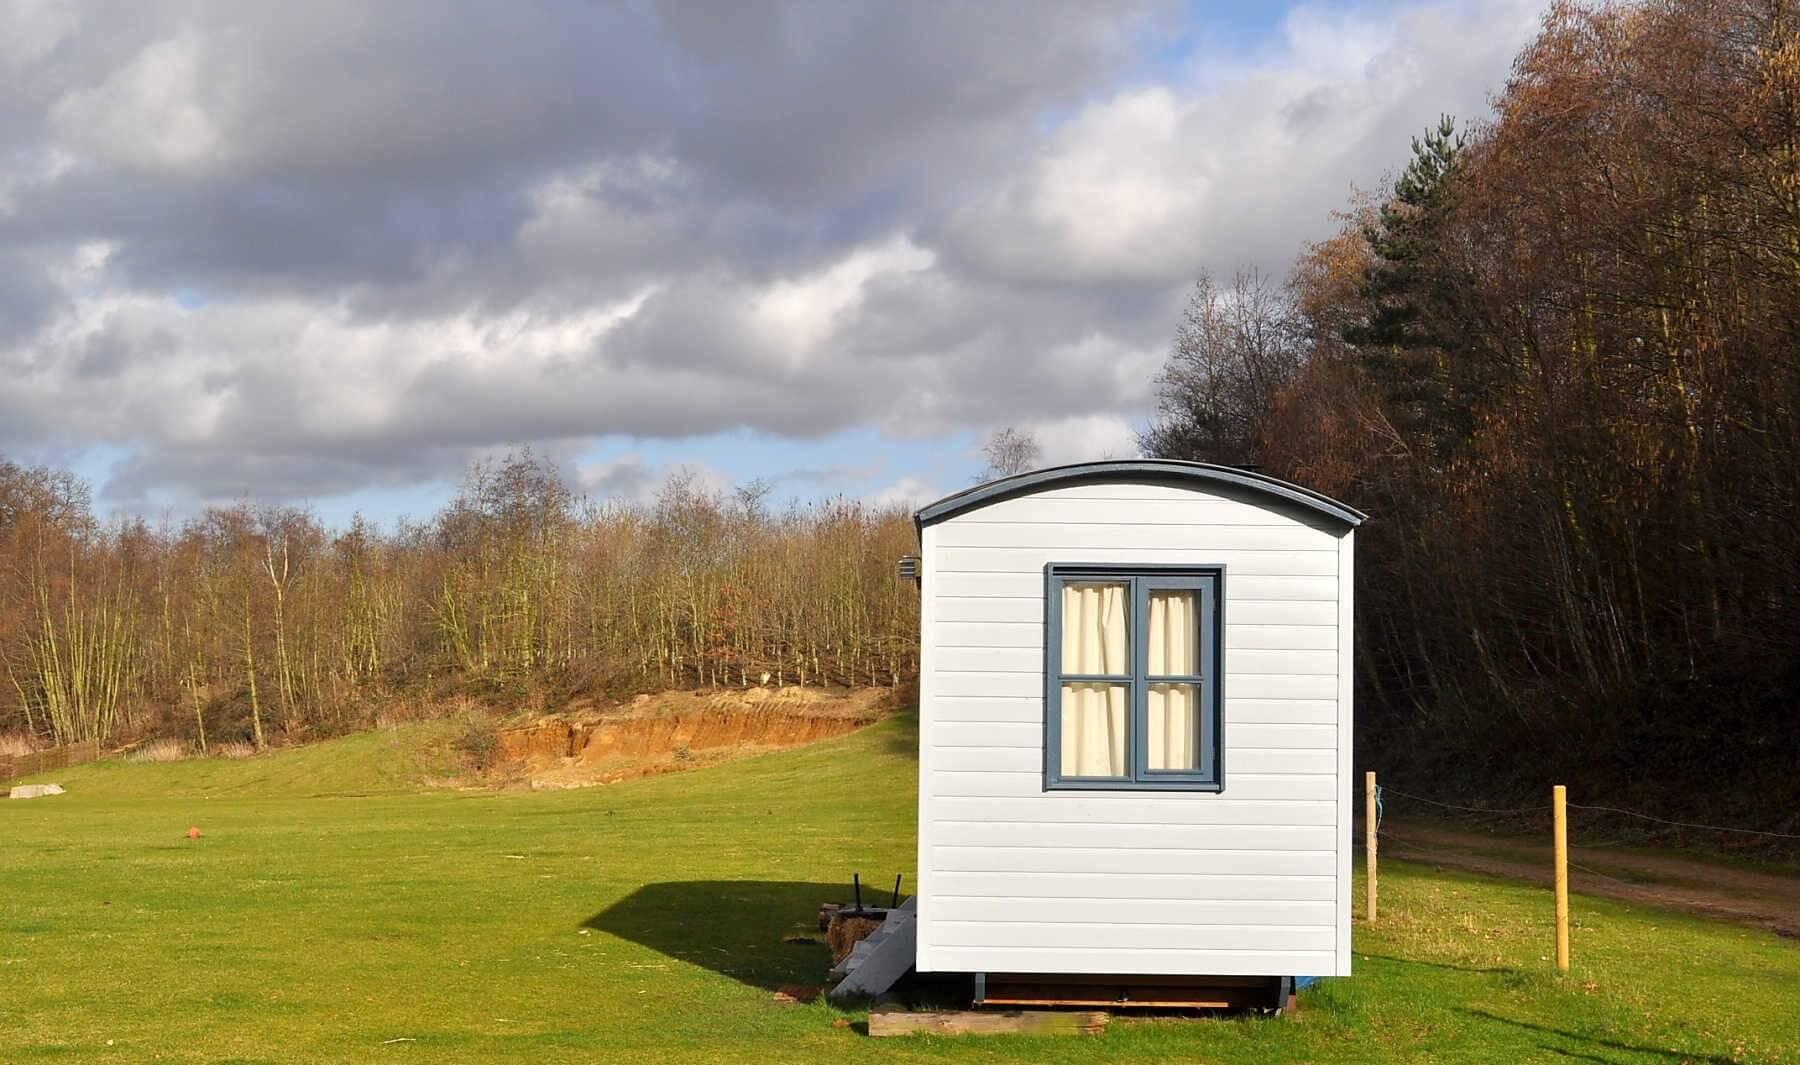 Whitlingham Broad Campsite, Norwich, Norfolk | Head Outside